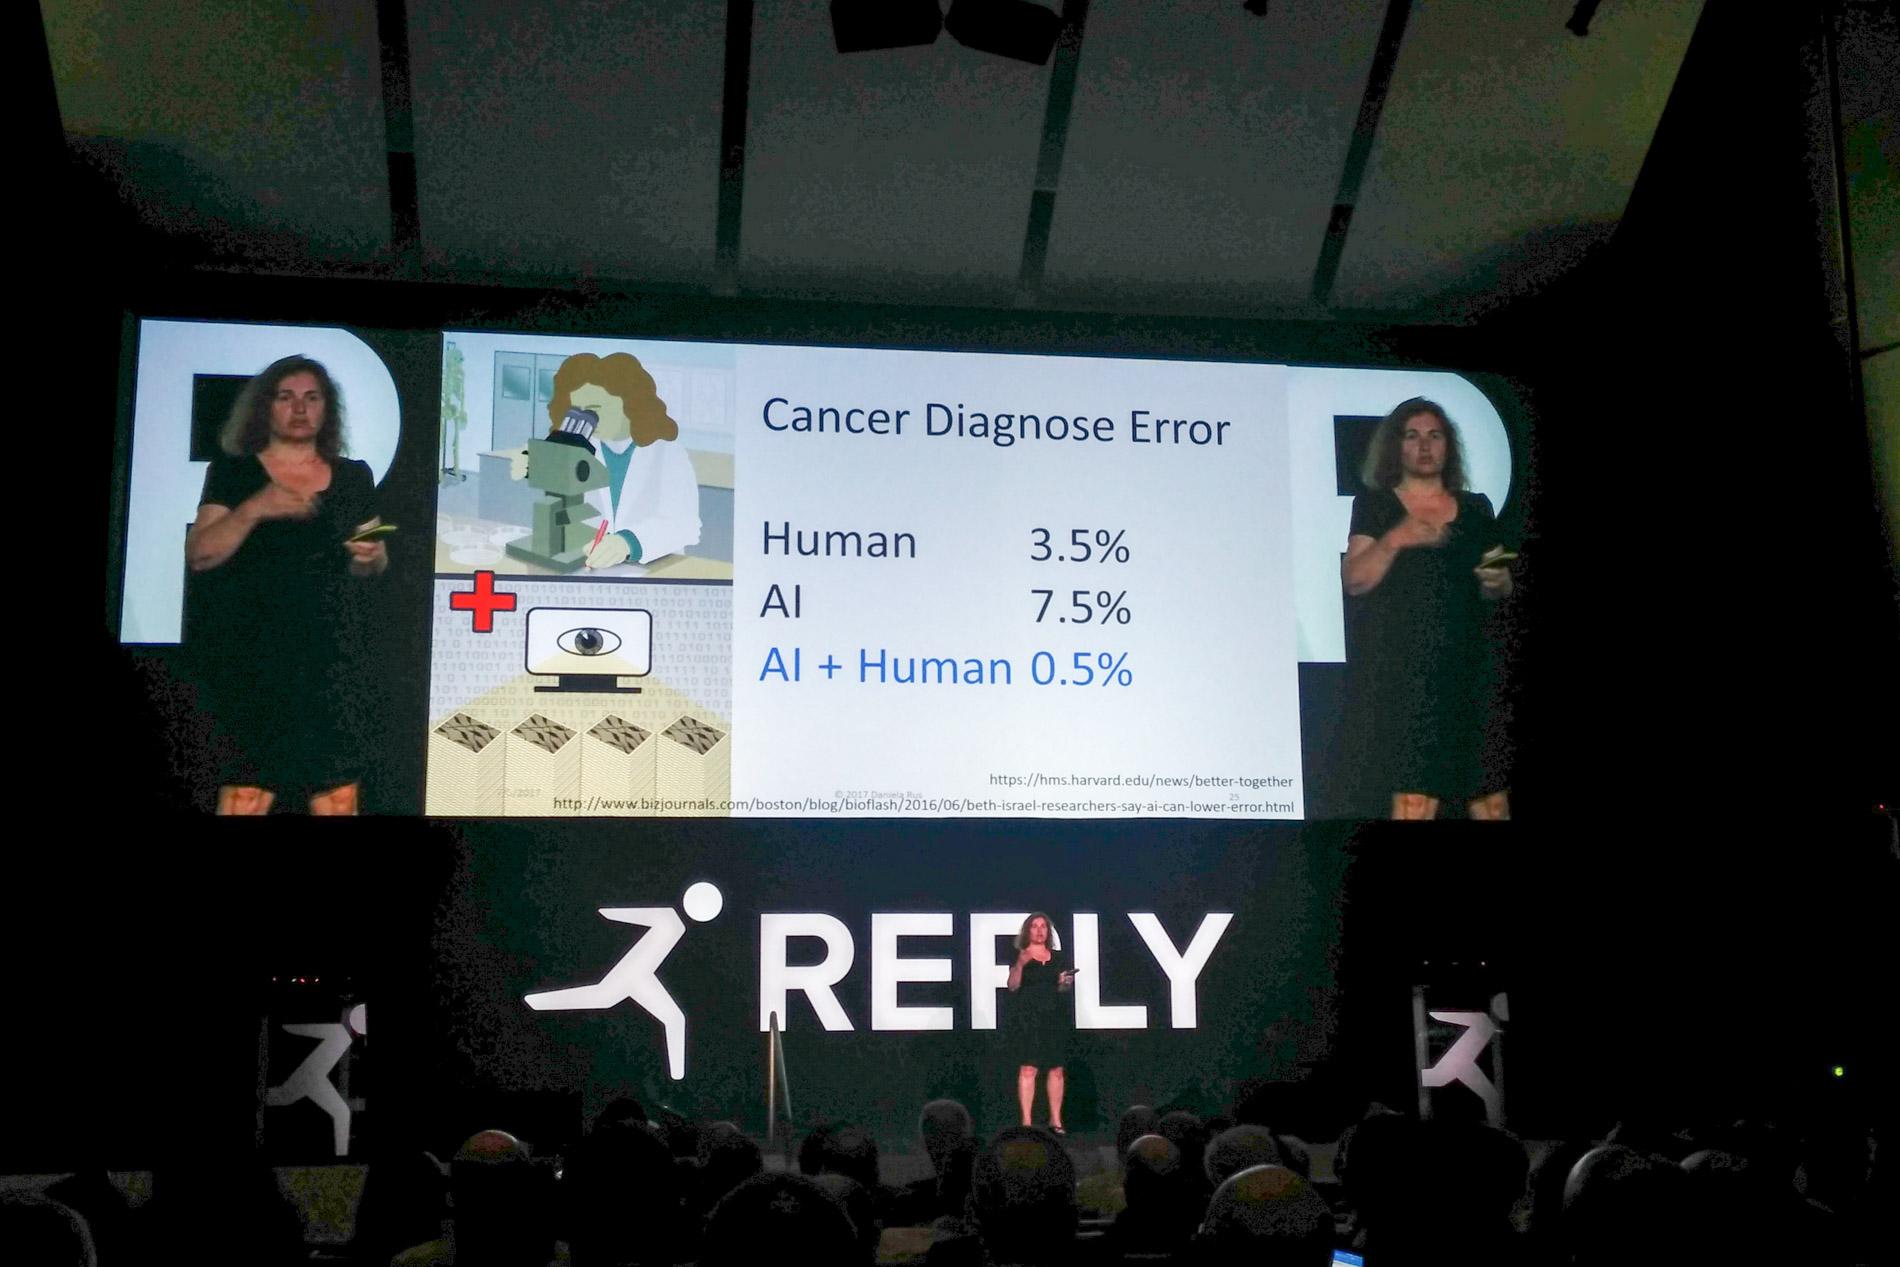 Reply Xchange 2017 Intelligenza umana e artificiale